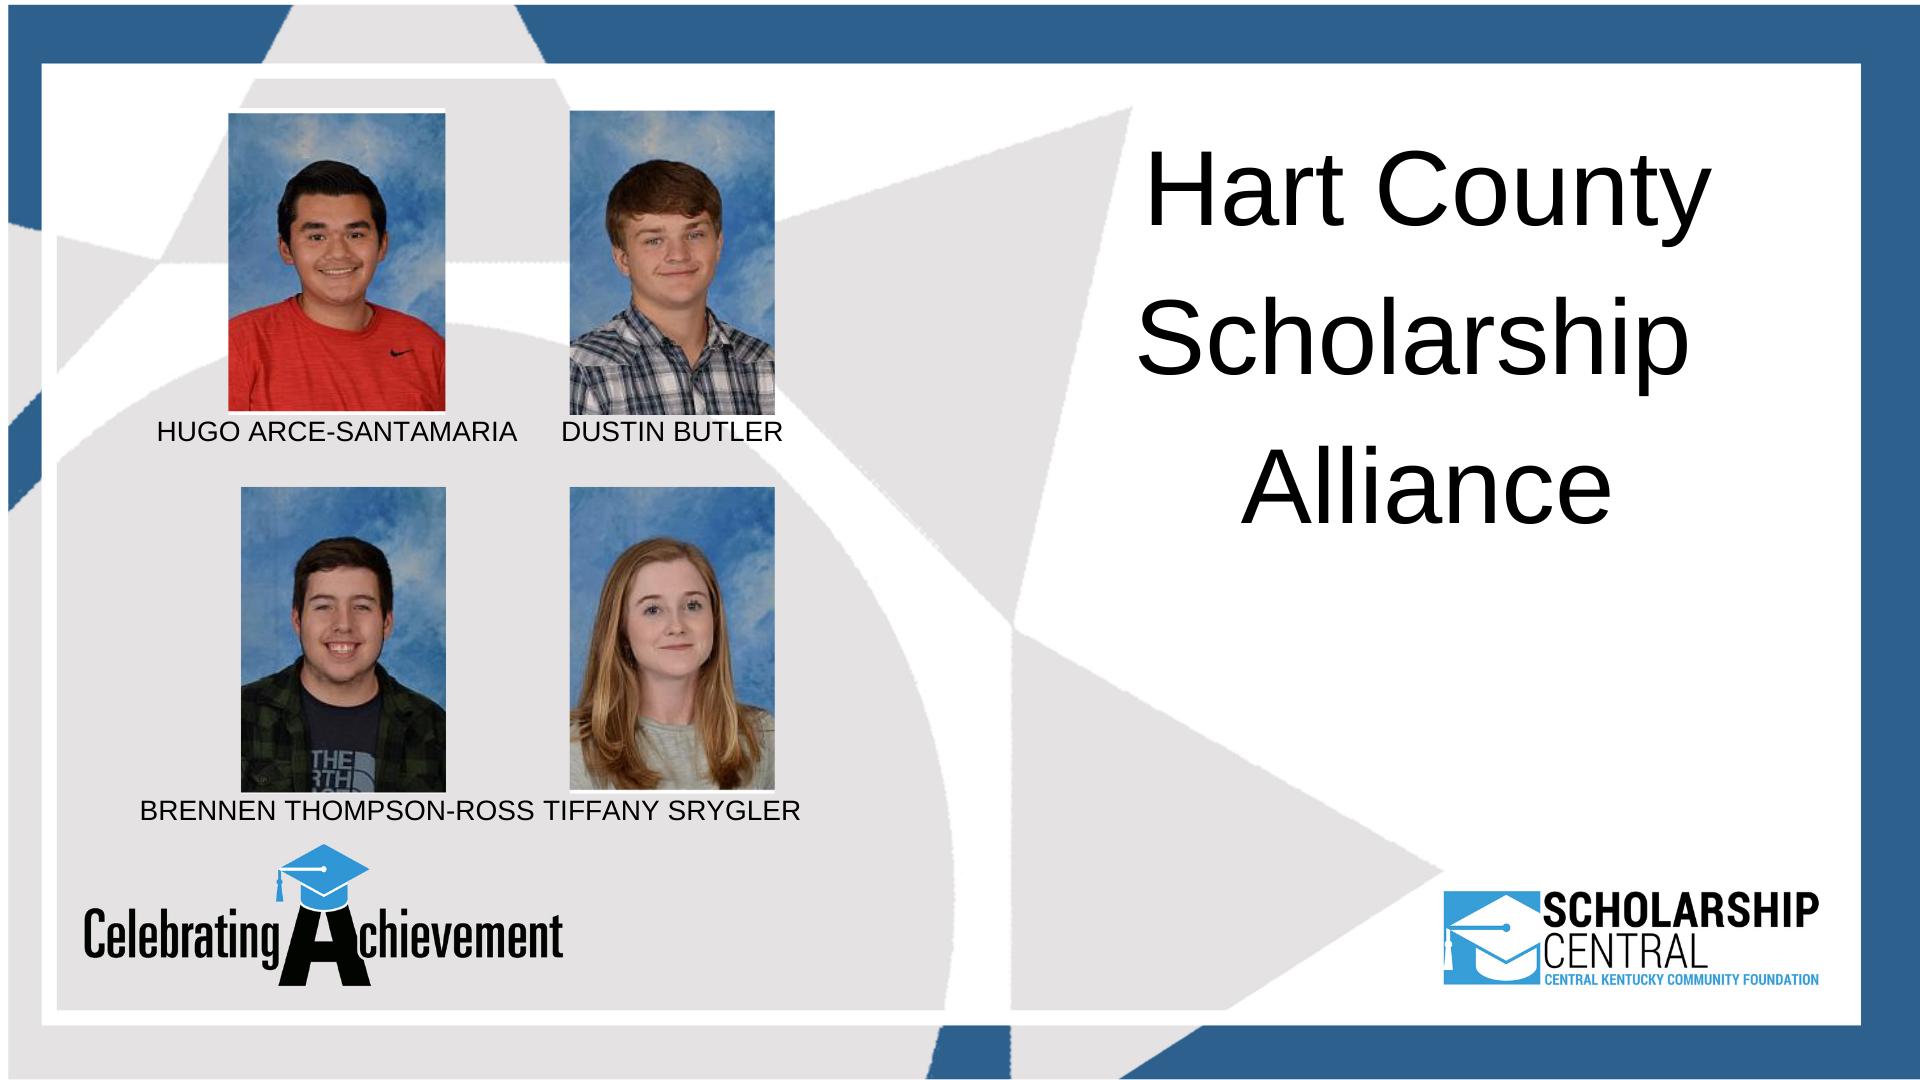 Hart County Alliance Scholarship Winners REVISED